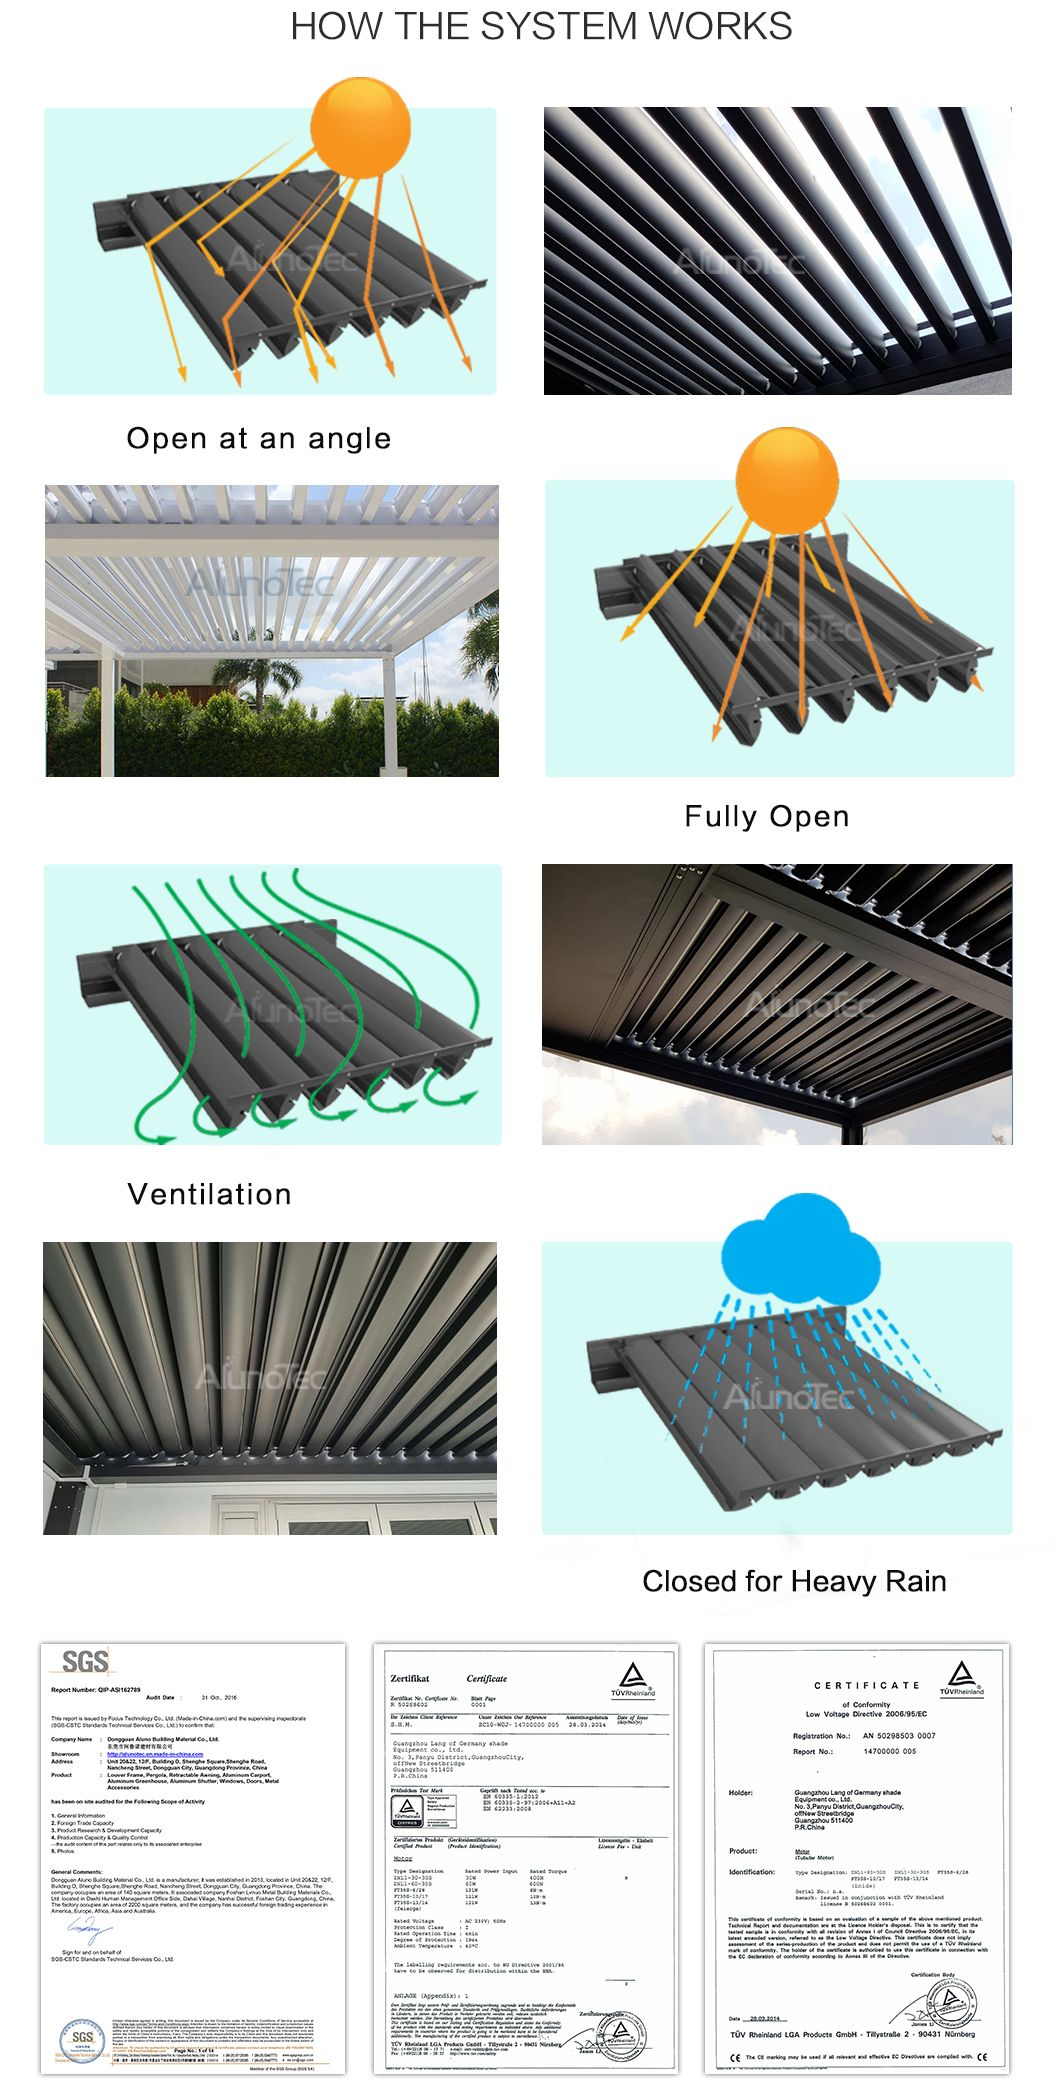 Modern Adjustable Aluminium Louvre Roof For Car Buy Aluminium Louvre Roof Big Awning Roof Awning Roof Pr In 2020 Aluminum Pergola Outdoor Pergola Waterproof Gazebo